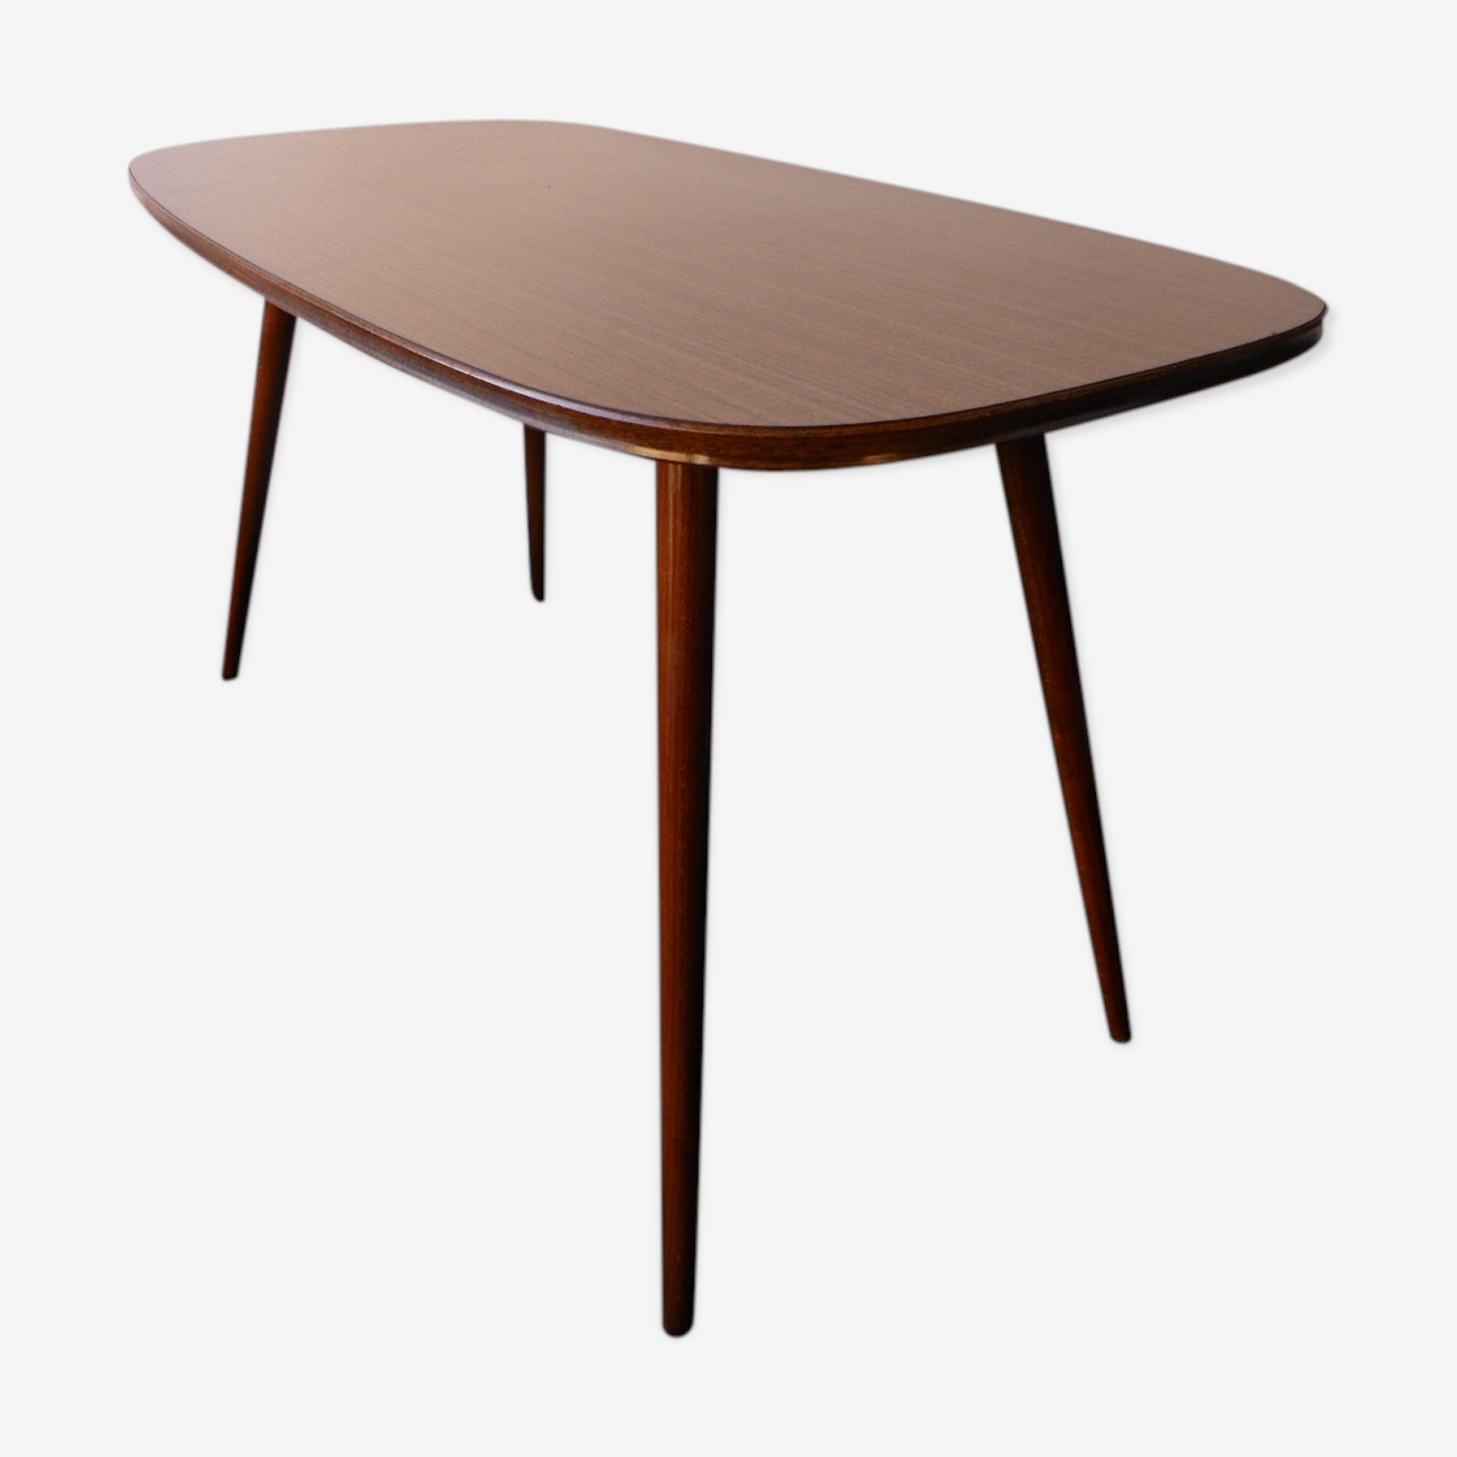 Vintage table coffee table 1960s